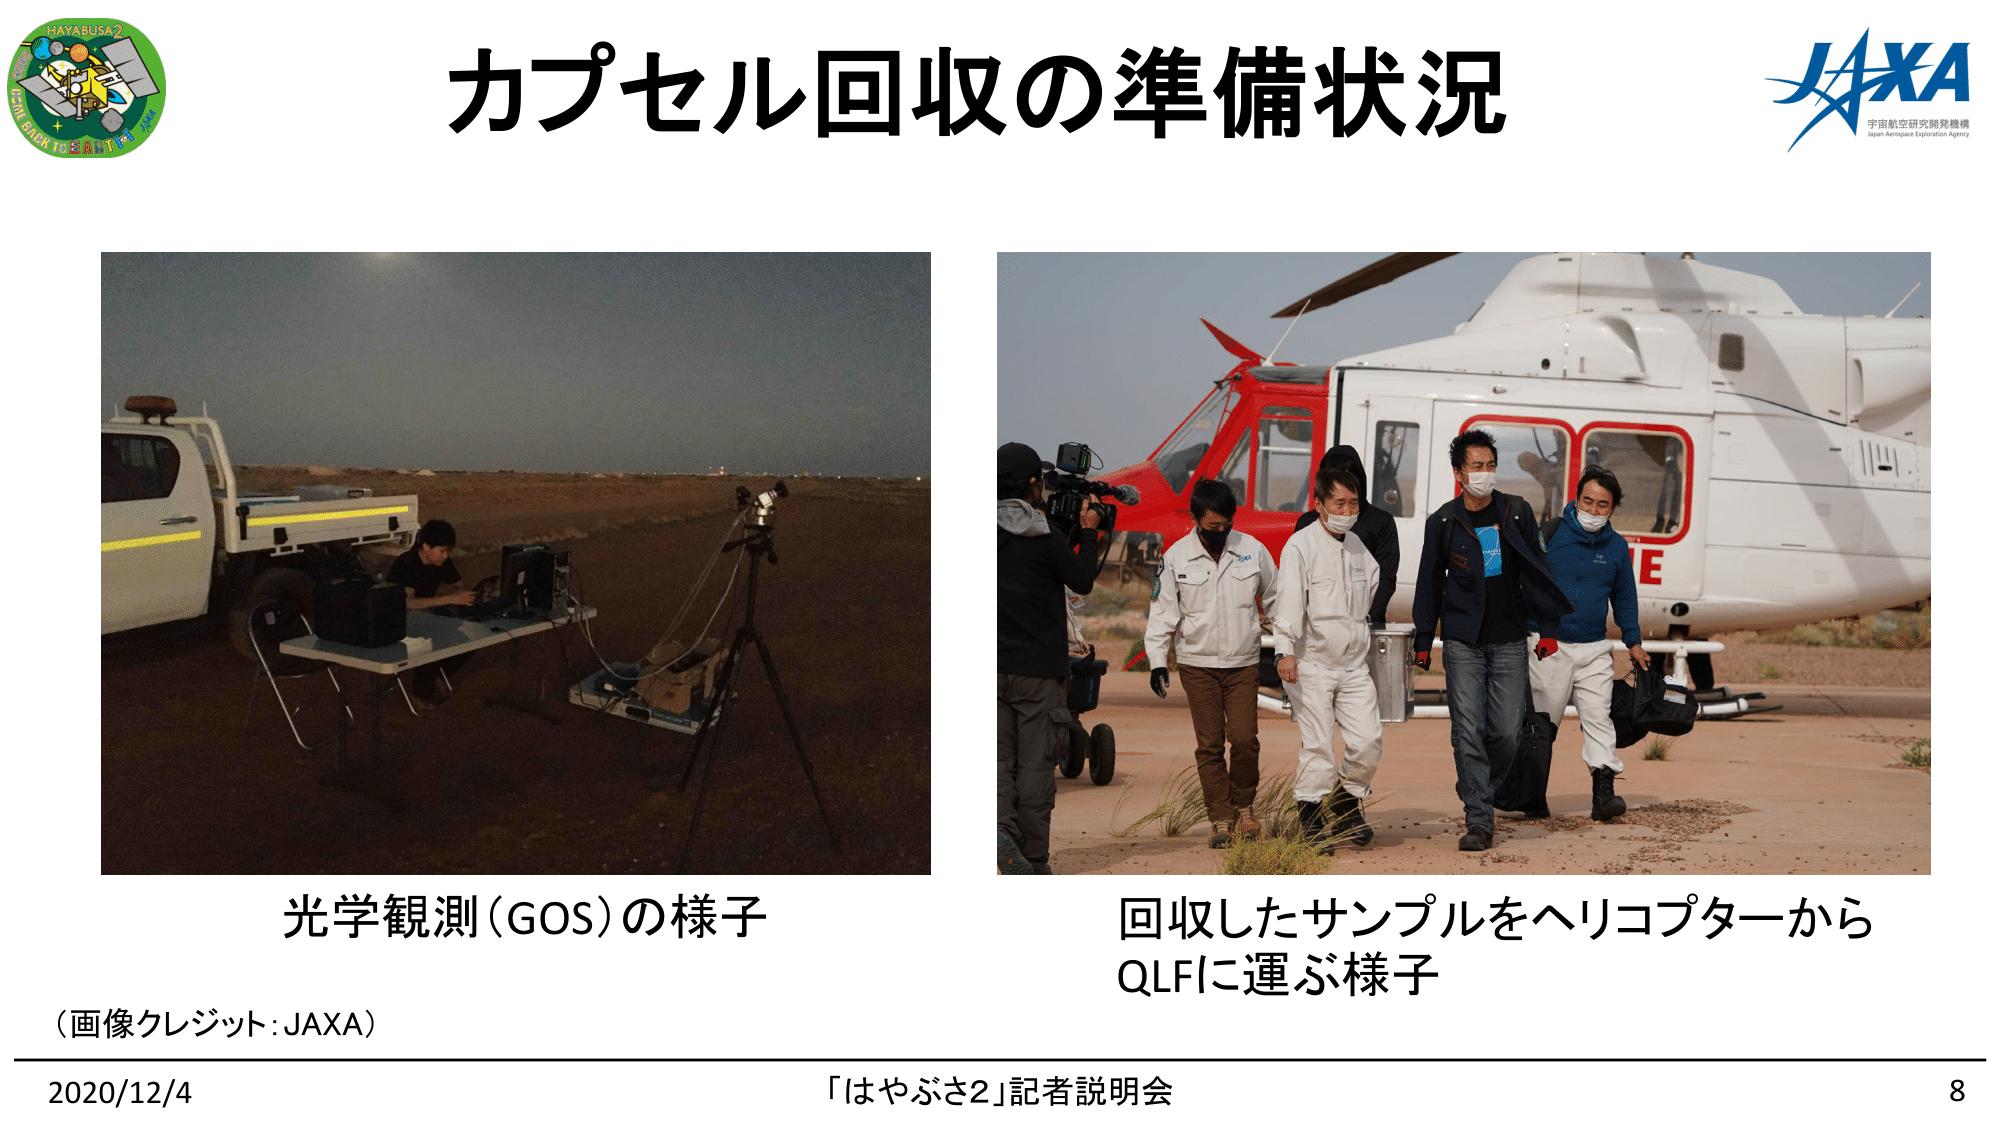 f:id:Imamura:20201204153810p:plain